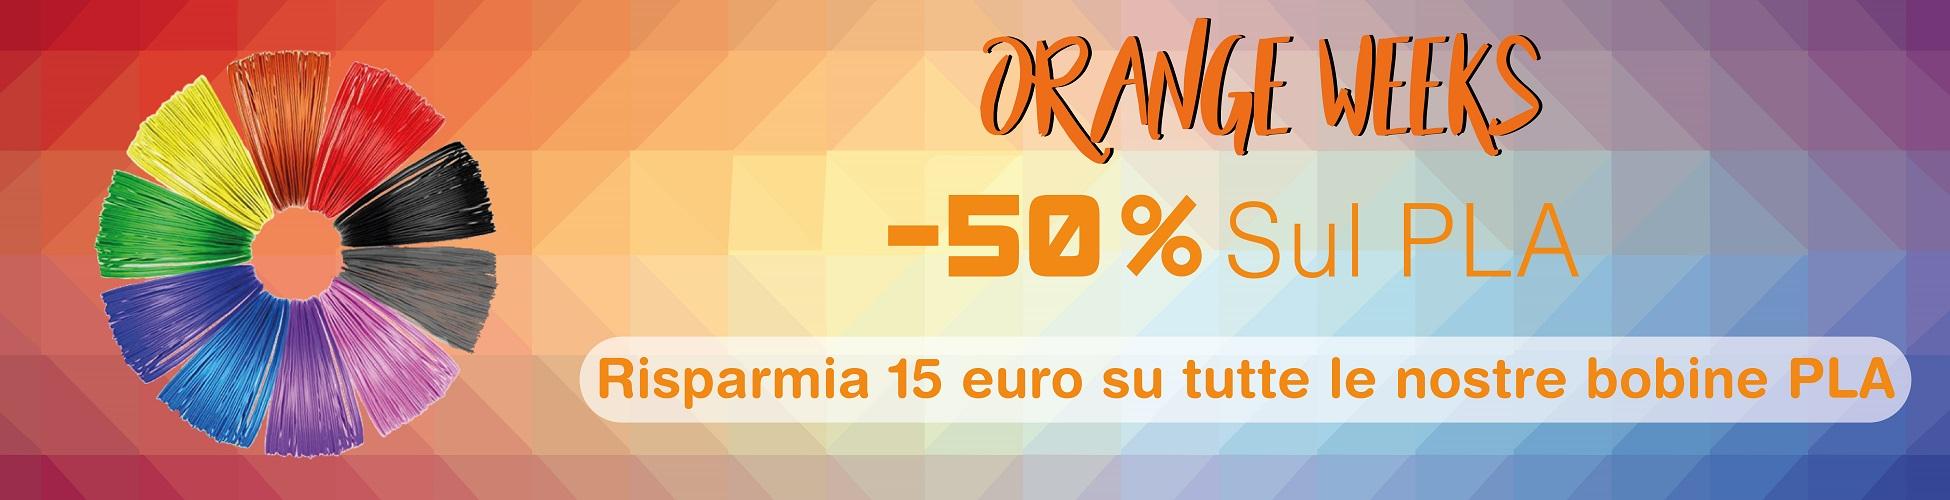 Banner Orange weeks filamento